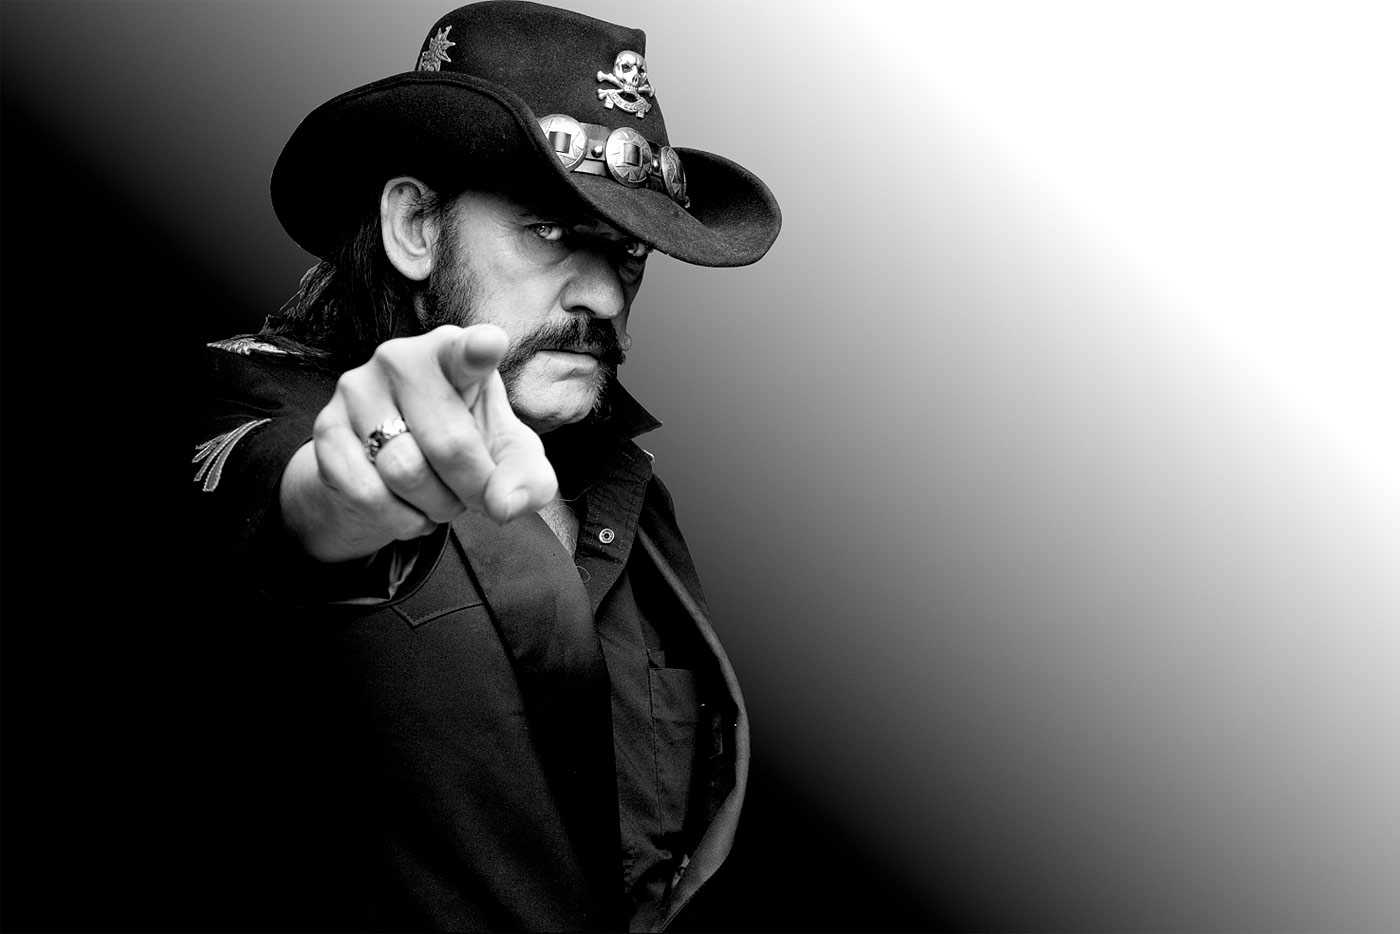 Únete a la procesión en homenaje a Lemmy